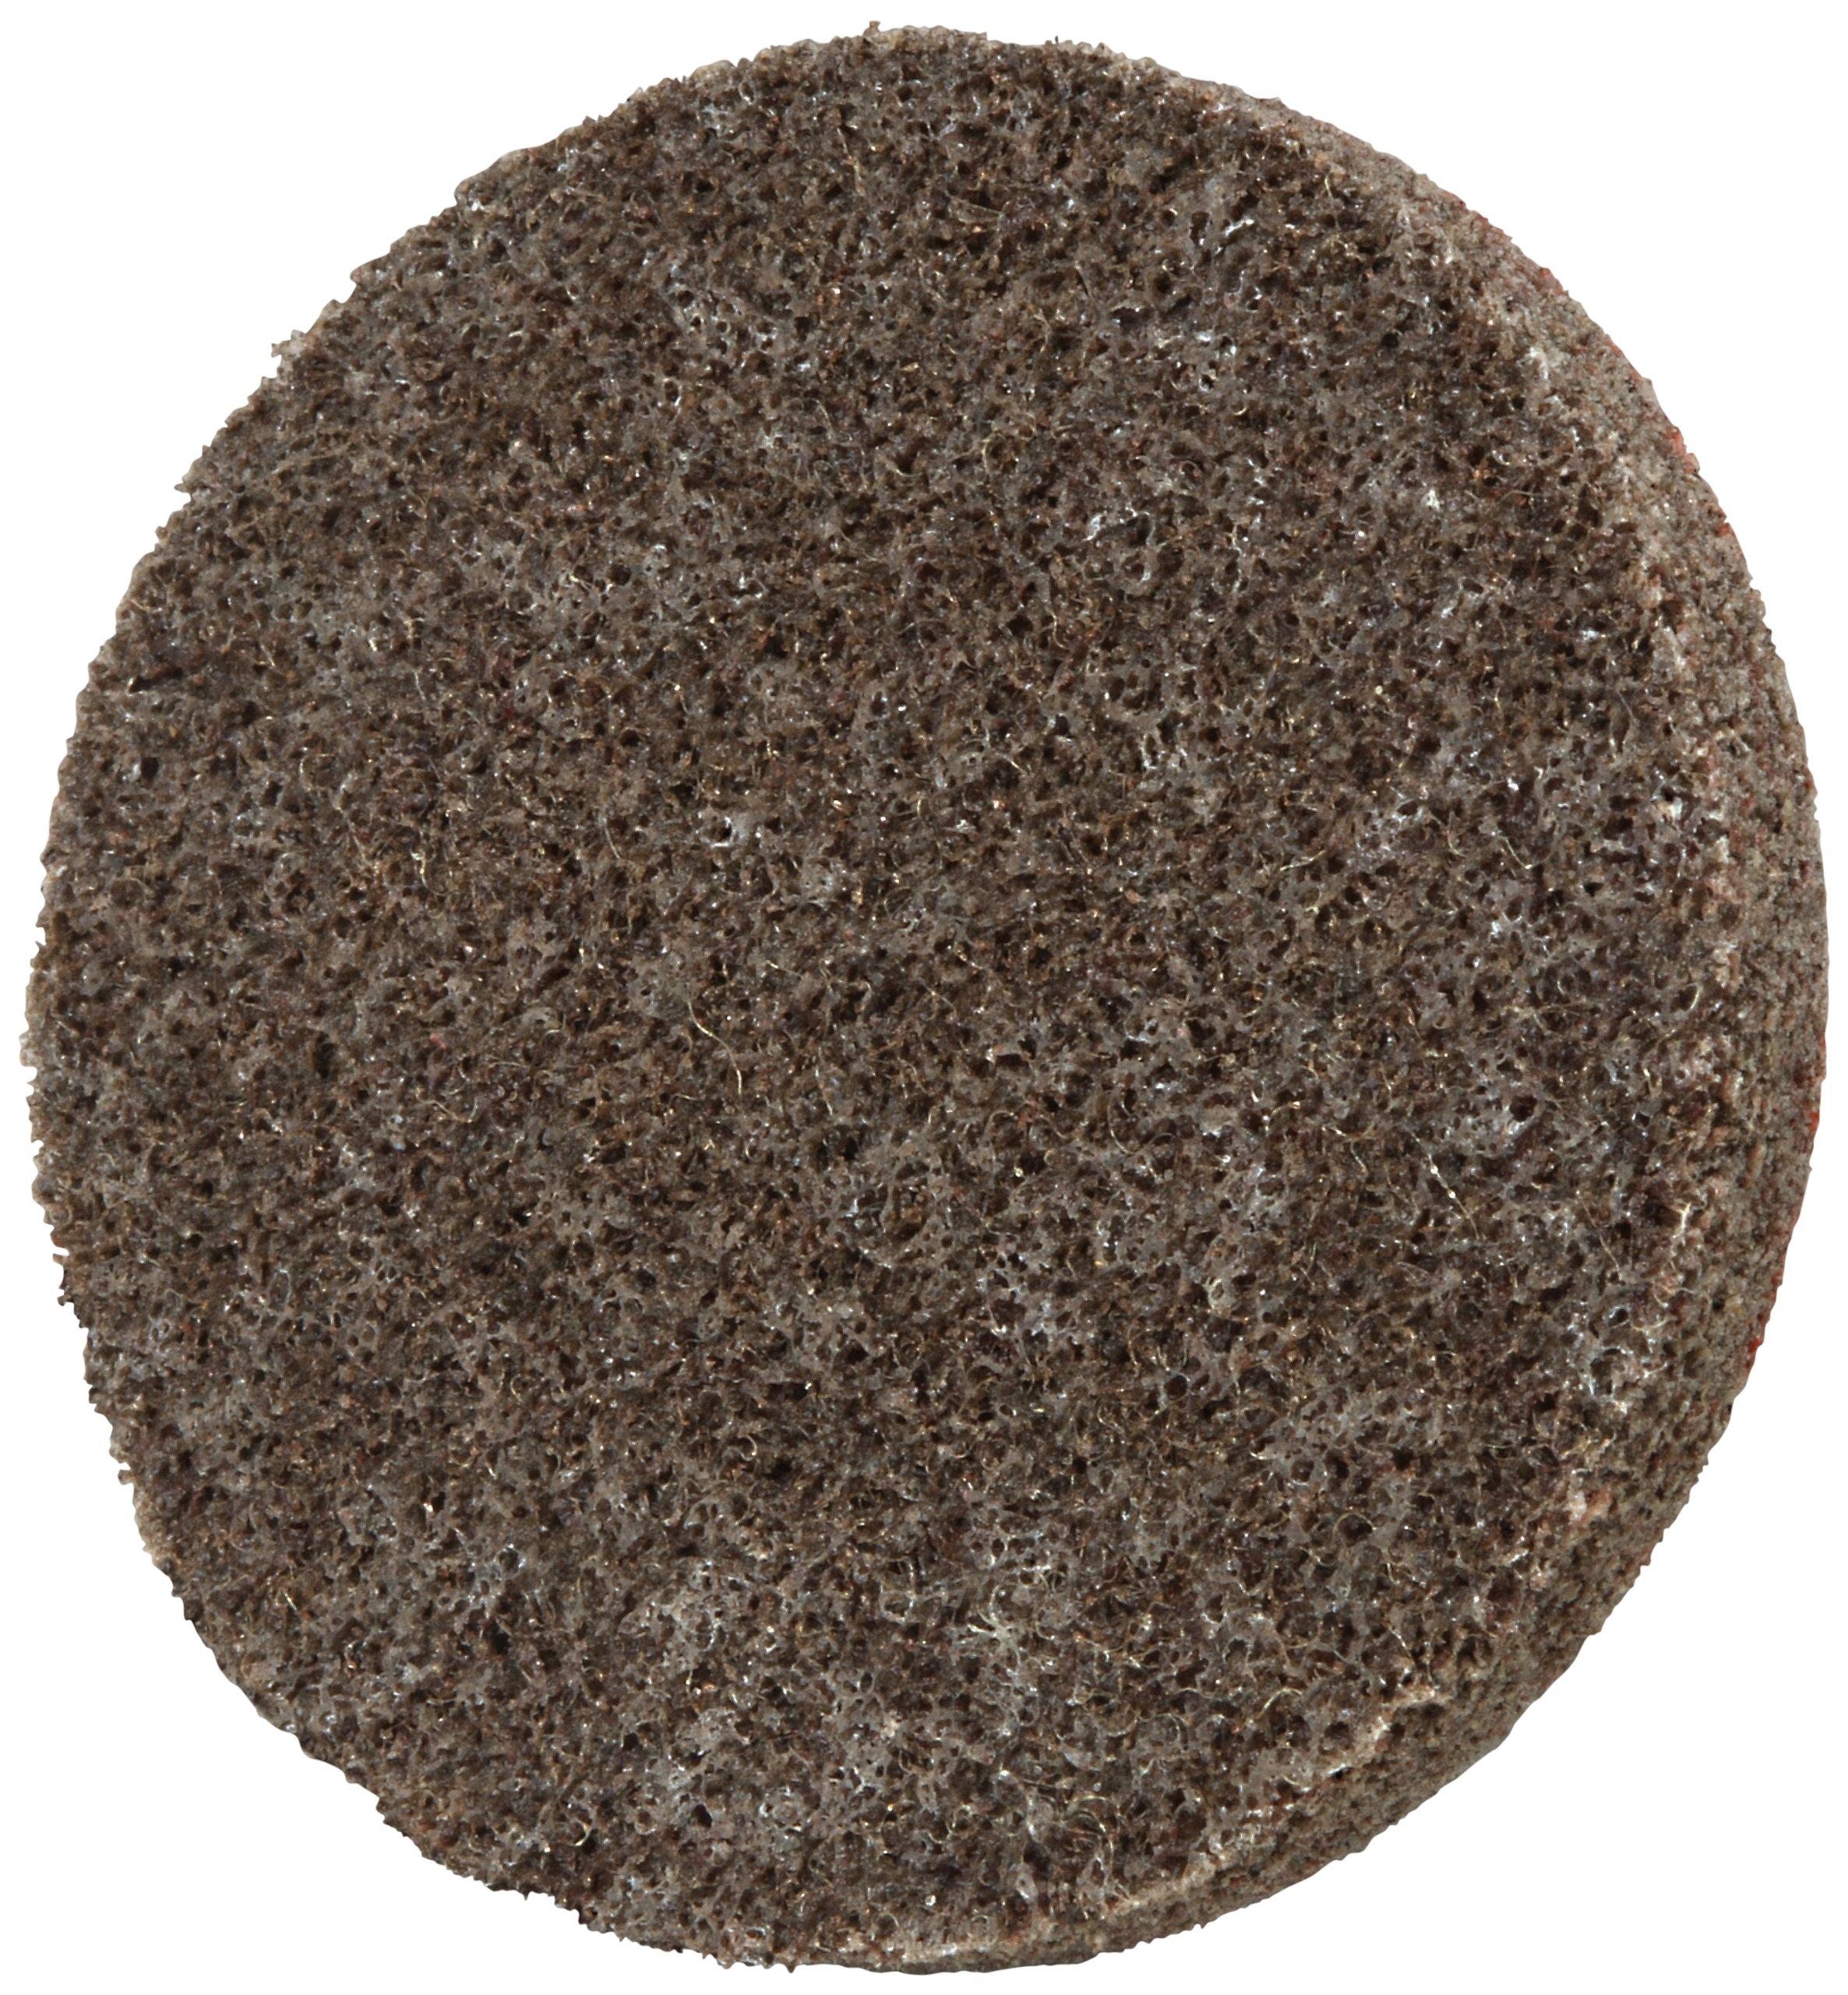 Scotch-Brite(TM) Roloc(TM) EXL Unitized Wheel TR, Aluminum Oxide, 22100 rpm, 2 Diameter, 8A Coarse Grit (Pack of 60)